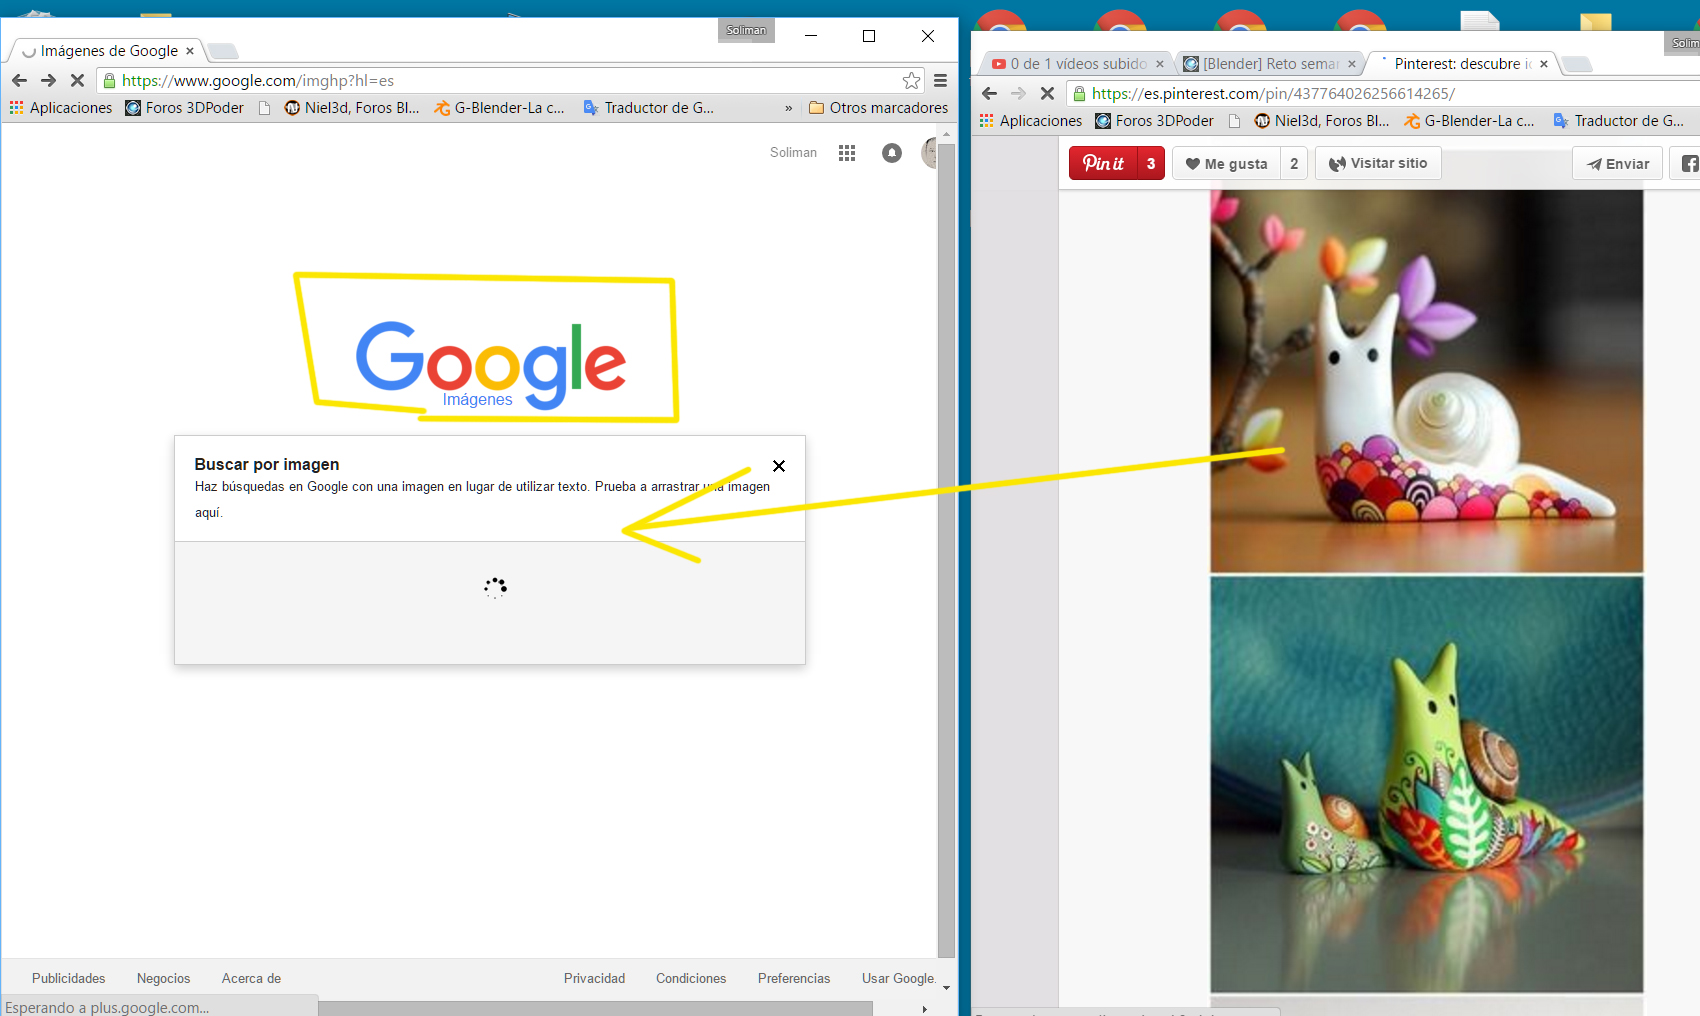 Reto semanal de modelado-google_imagenes.jpg